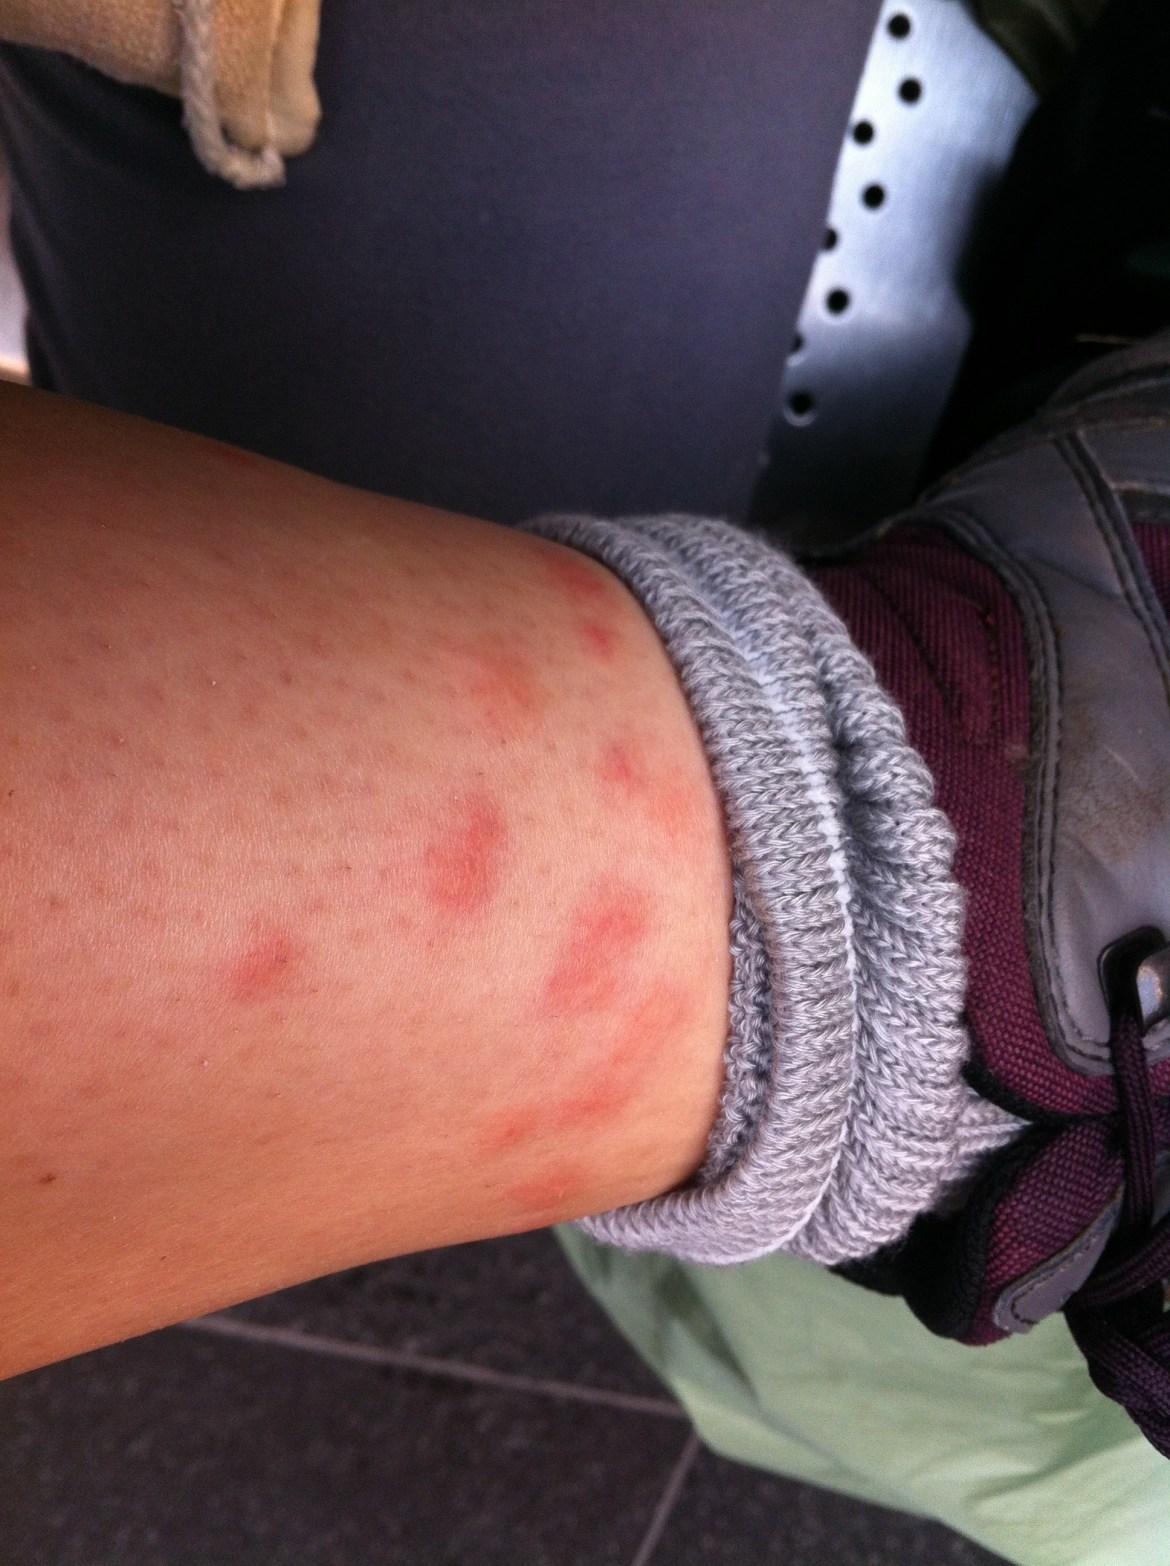 piqûre de midge allergie